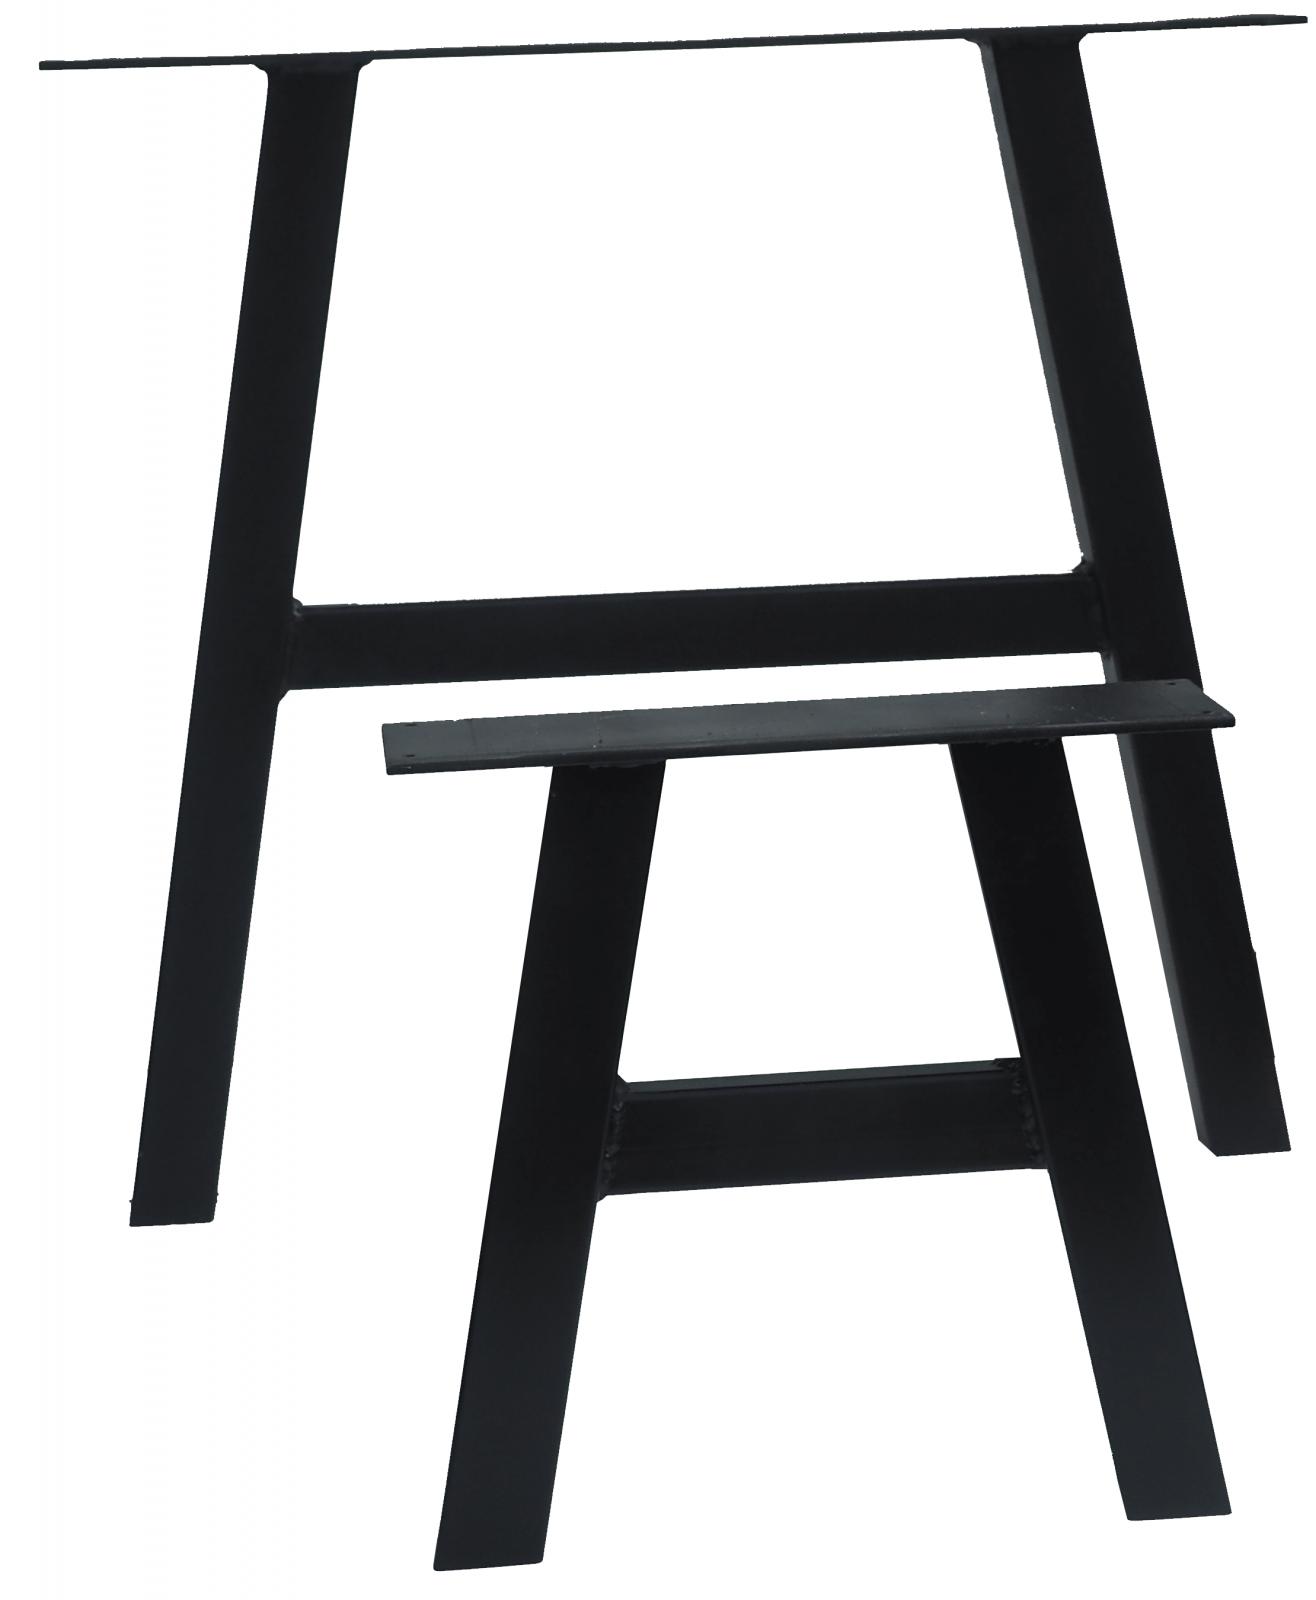 A Frame Table Base Angle Small & Large